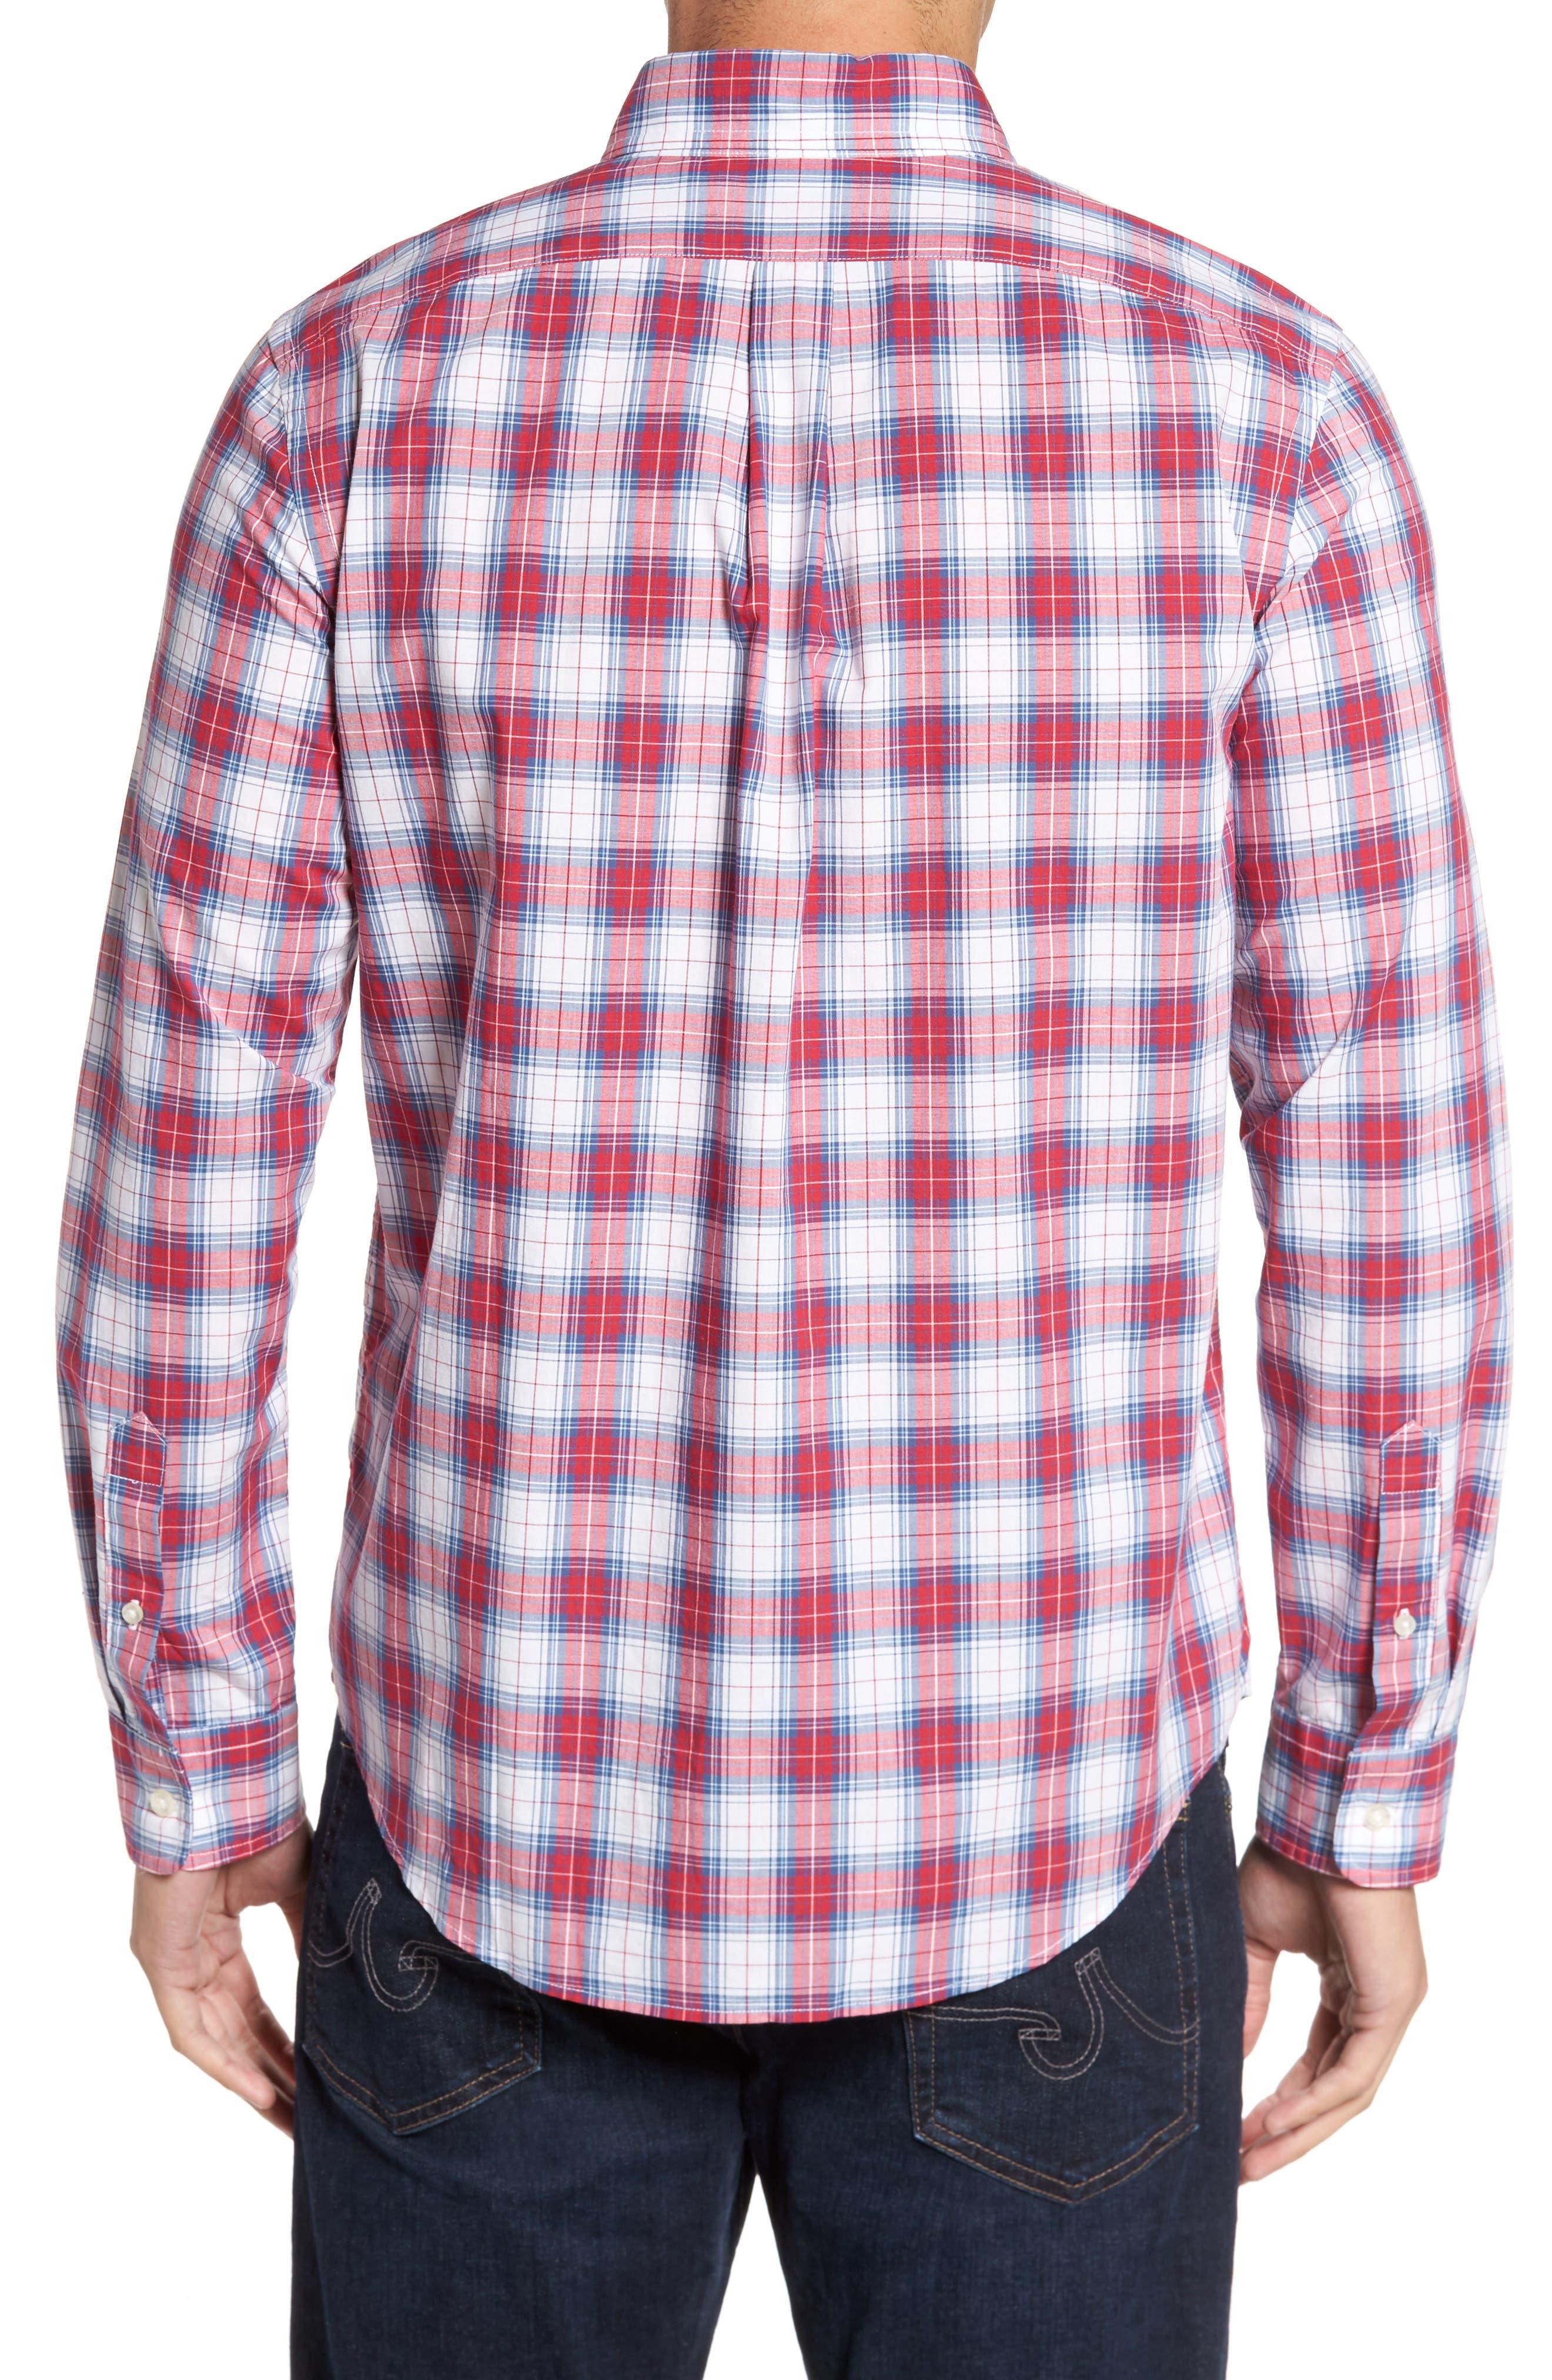 Murray Bucklin Point Slim Fit Plaid Sport Shirt,                             Alternate thumbnail 2, color,